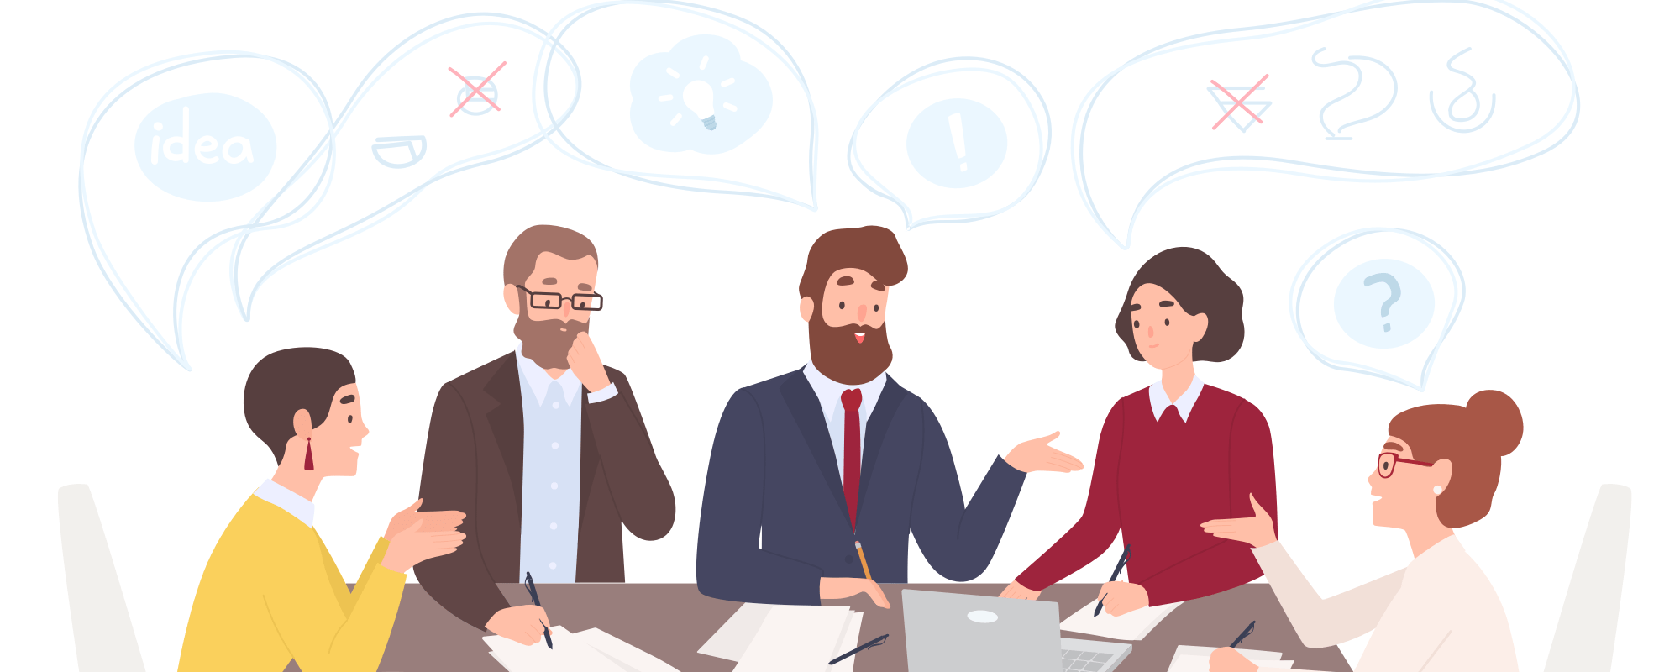 Cartoon image of staff talking in an office